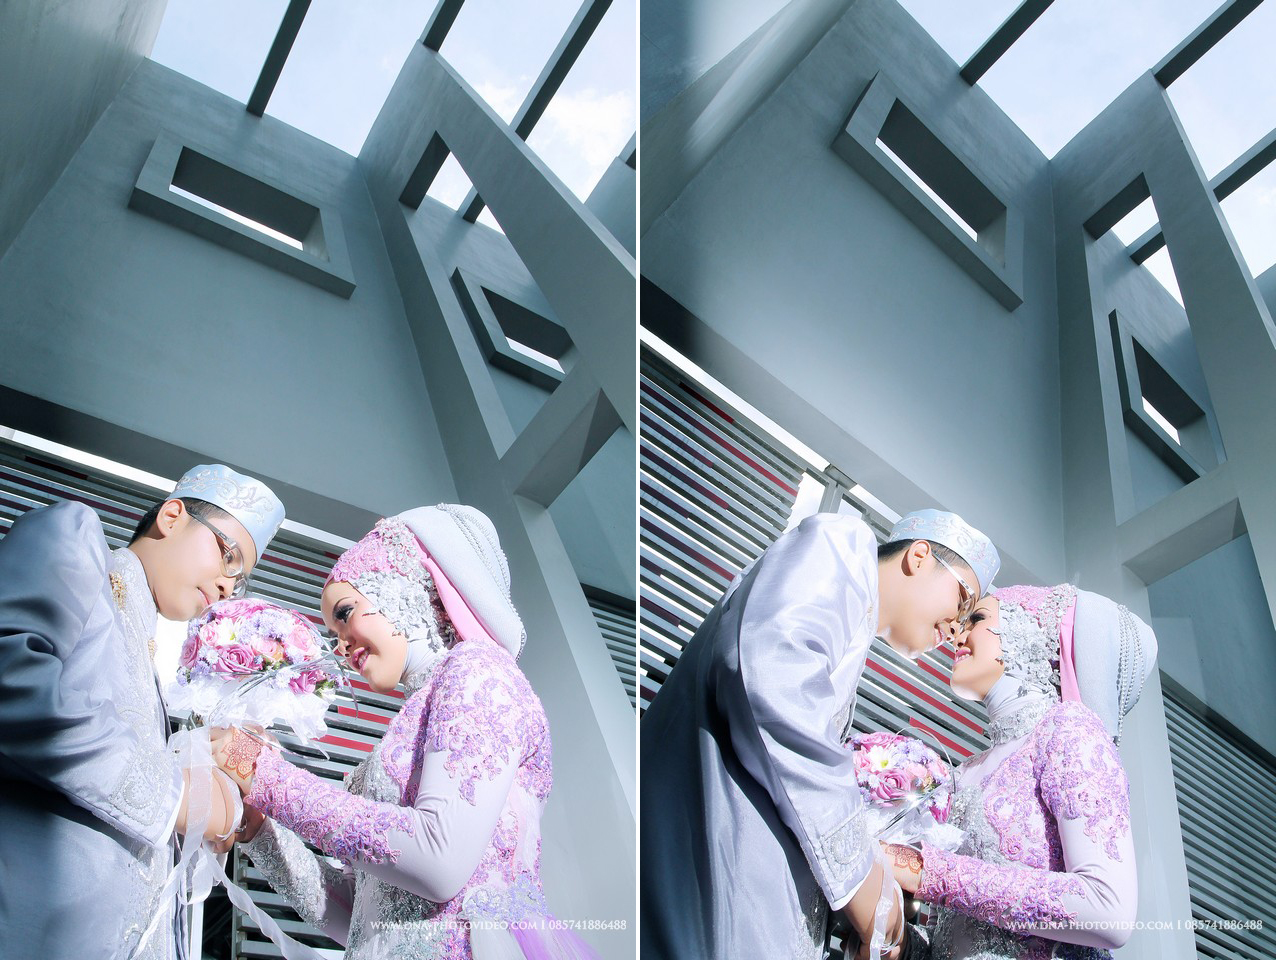 harga Jasa Fotografer Pernikahan Kebaya Ungu Silver Gedung LPP Jogjakarta Tokopedia.com